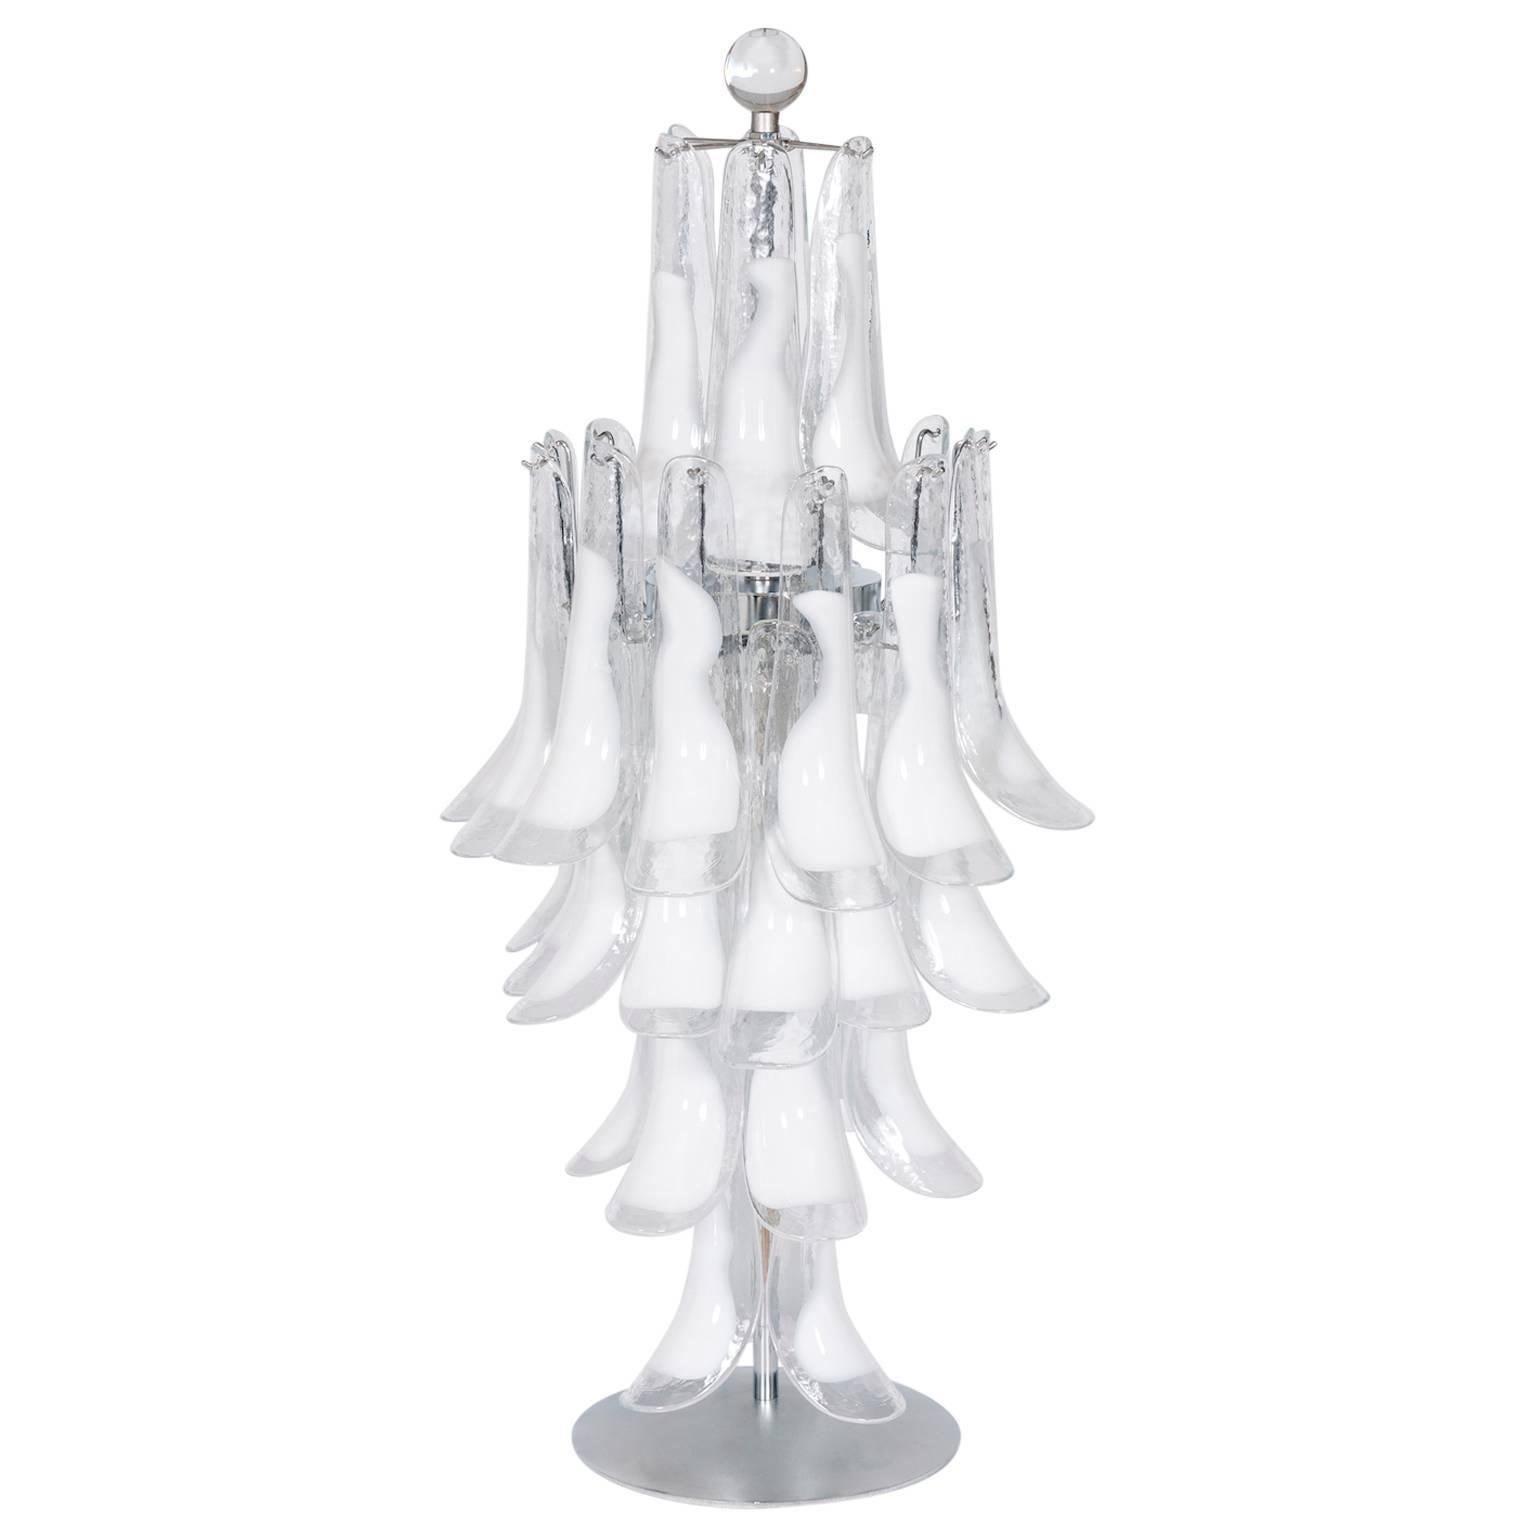 Italian Venetian, Table Lamp, Blown Murano Glass, White Attr to Mazzega, 1970s